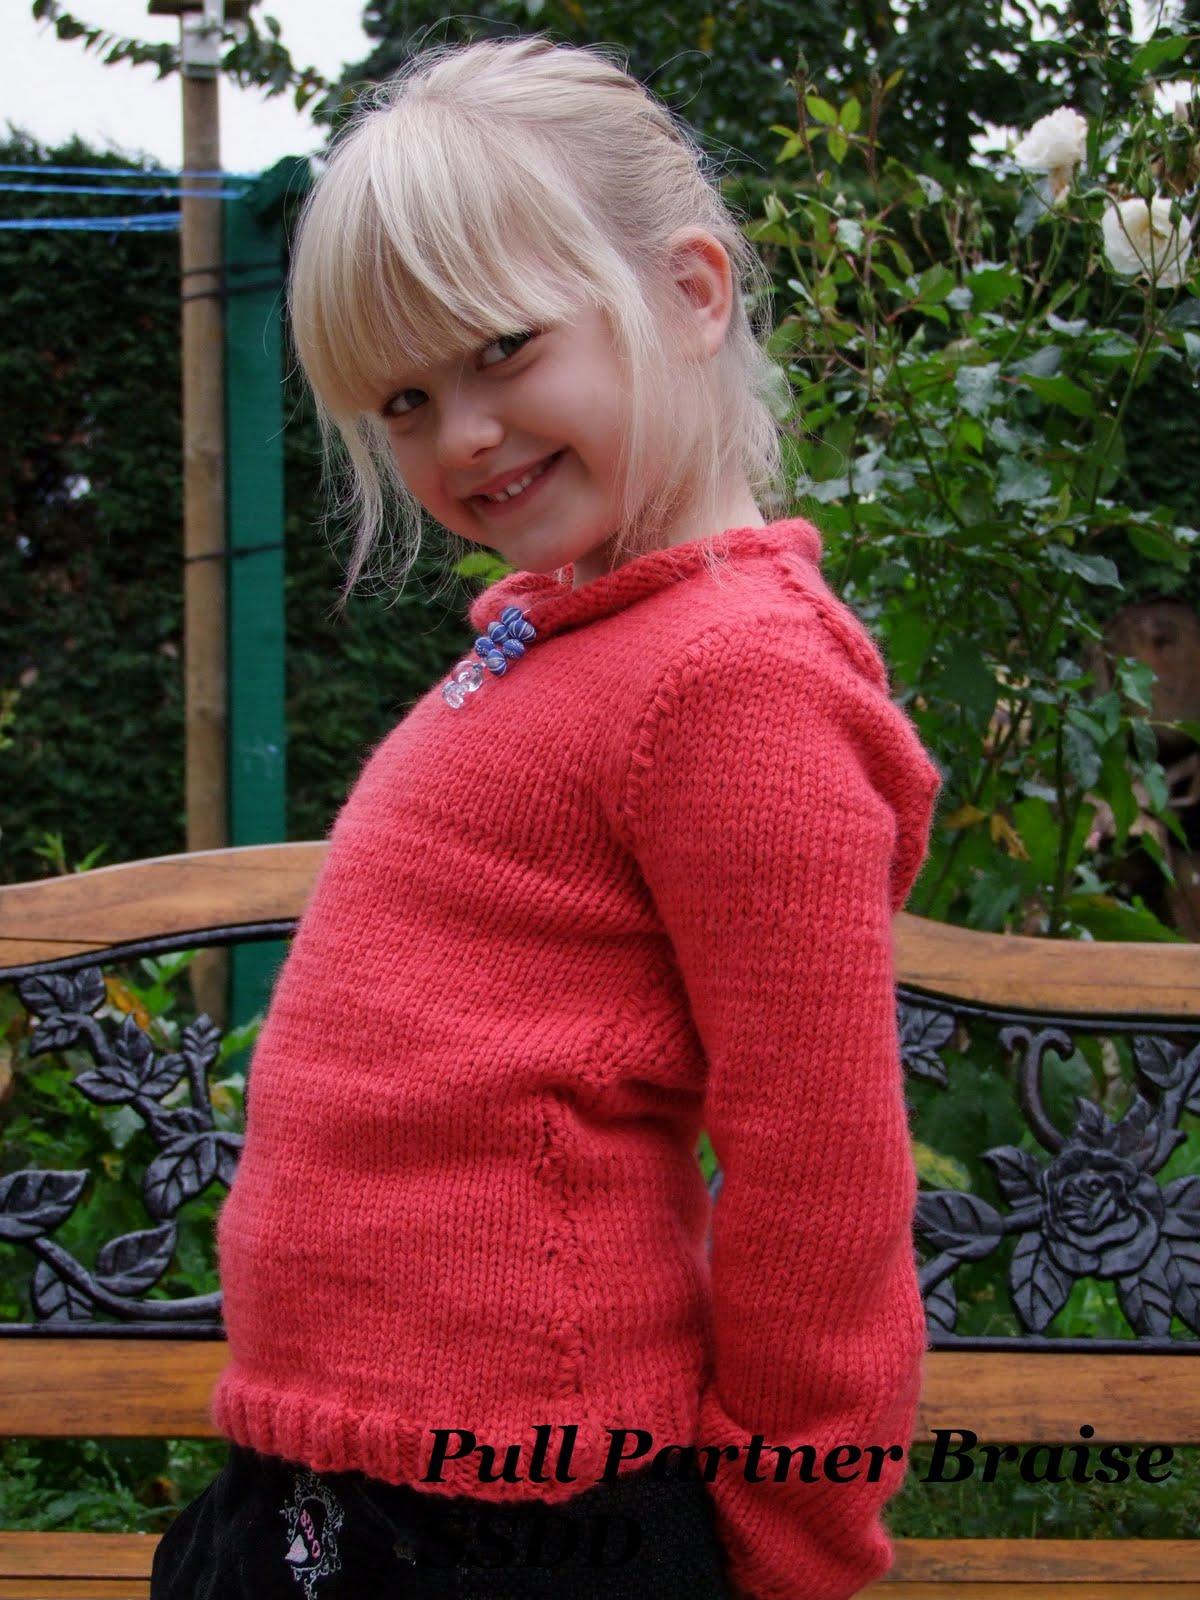 tricoter un pull fille 8 ans